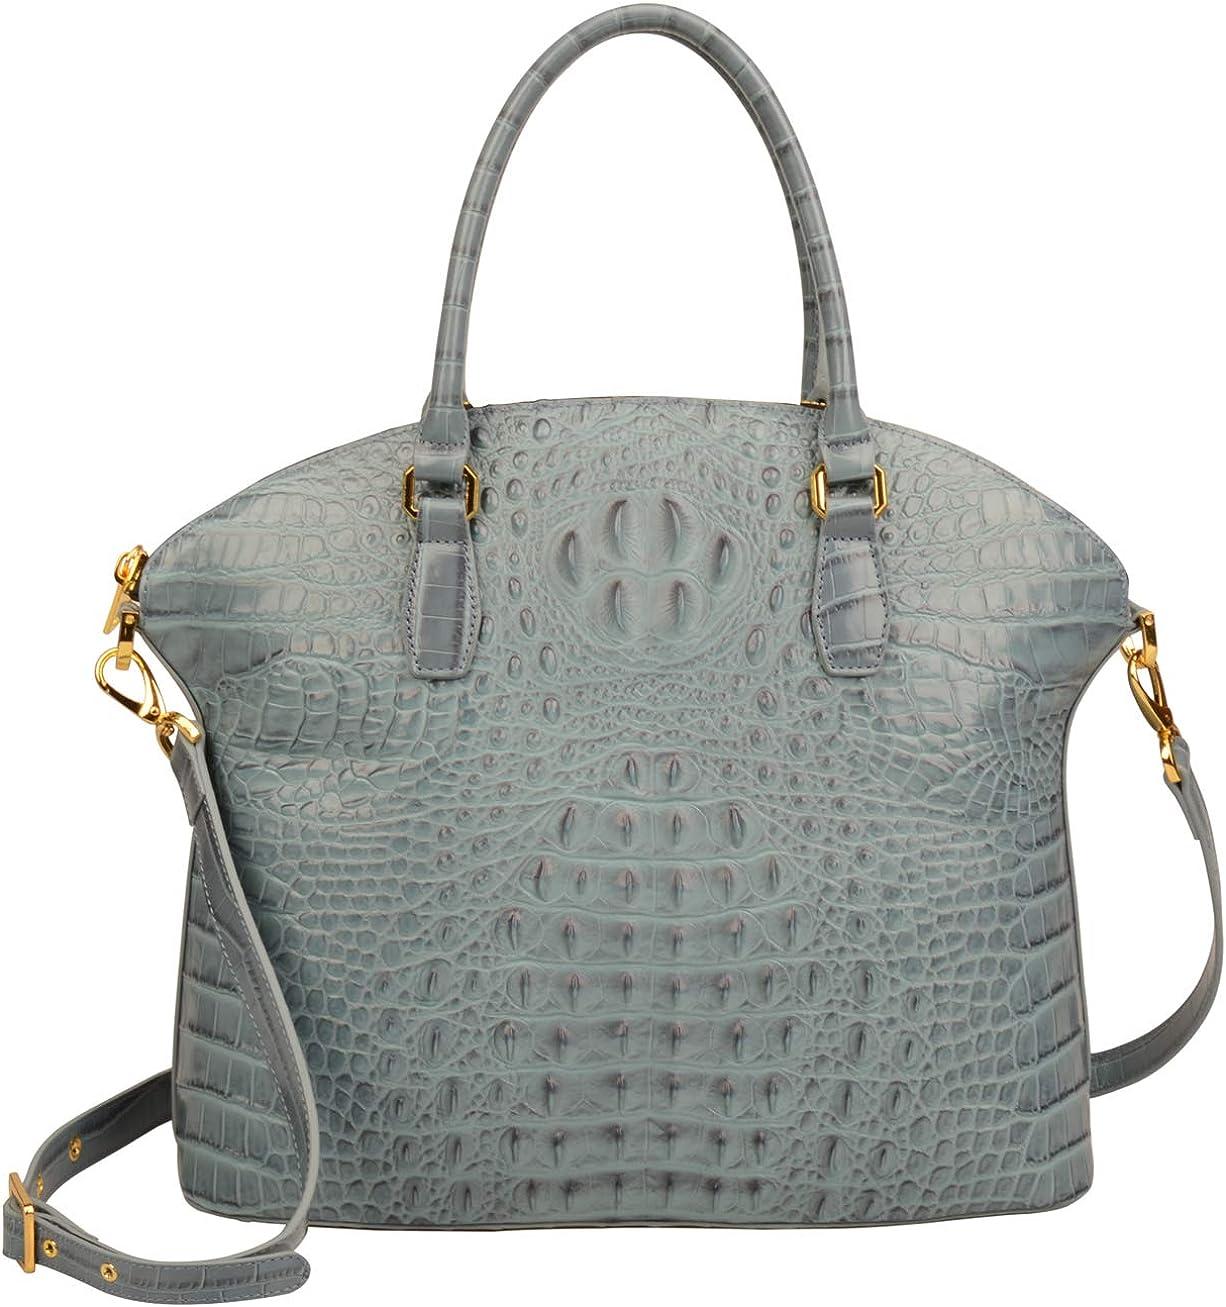 Ainifeel Women's Genuine Leather Designer Crocodile Large Top Handle Handbags Satchel Shoulder Bags